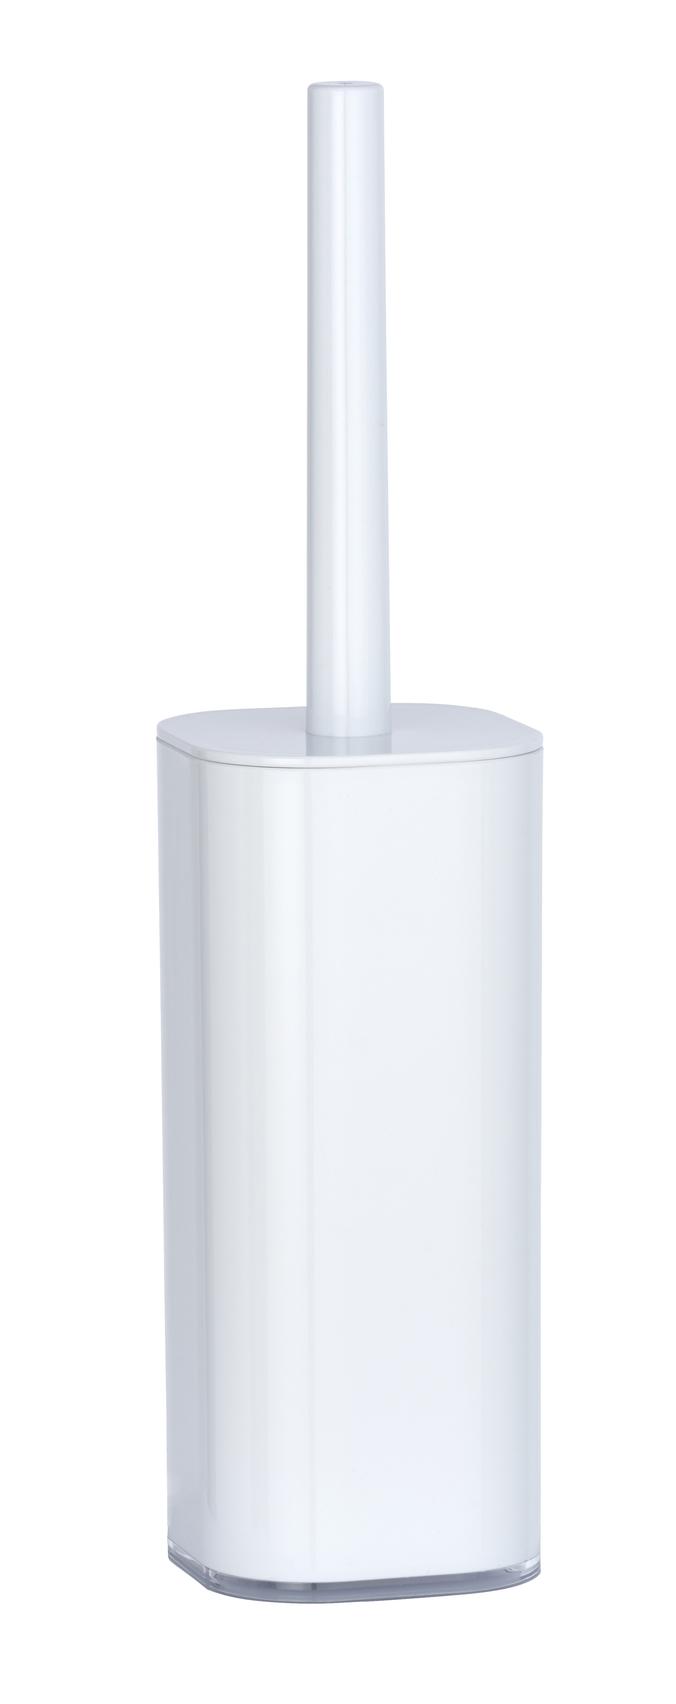 Perie de toaleta cu suport din acril, Oria Alb, L9xl9xH38,5 cm imagine